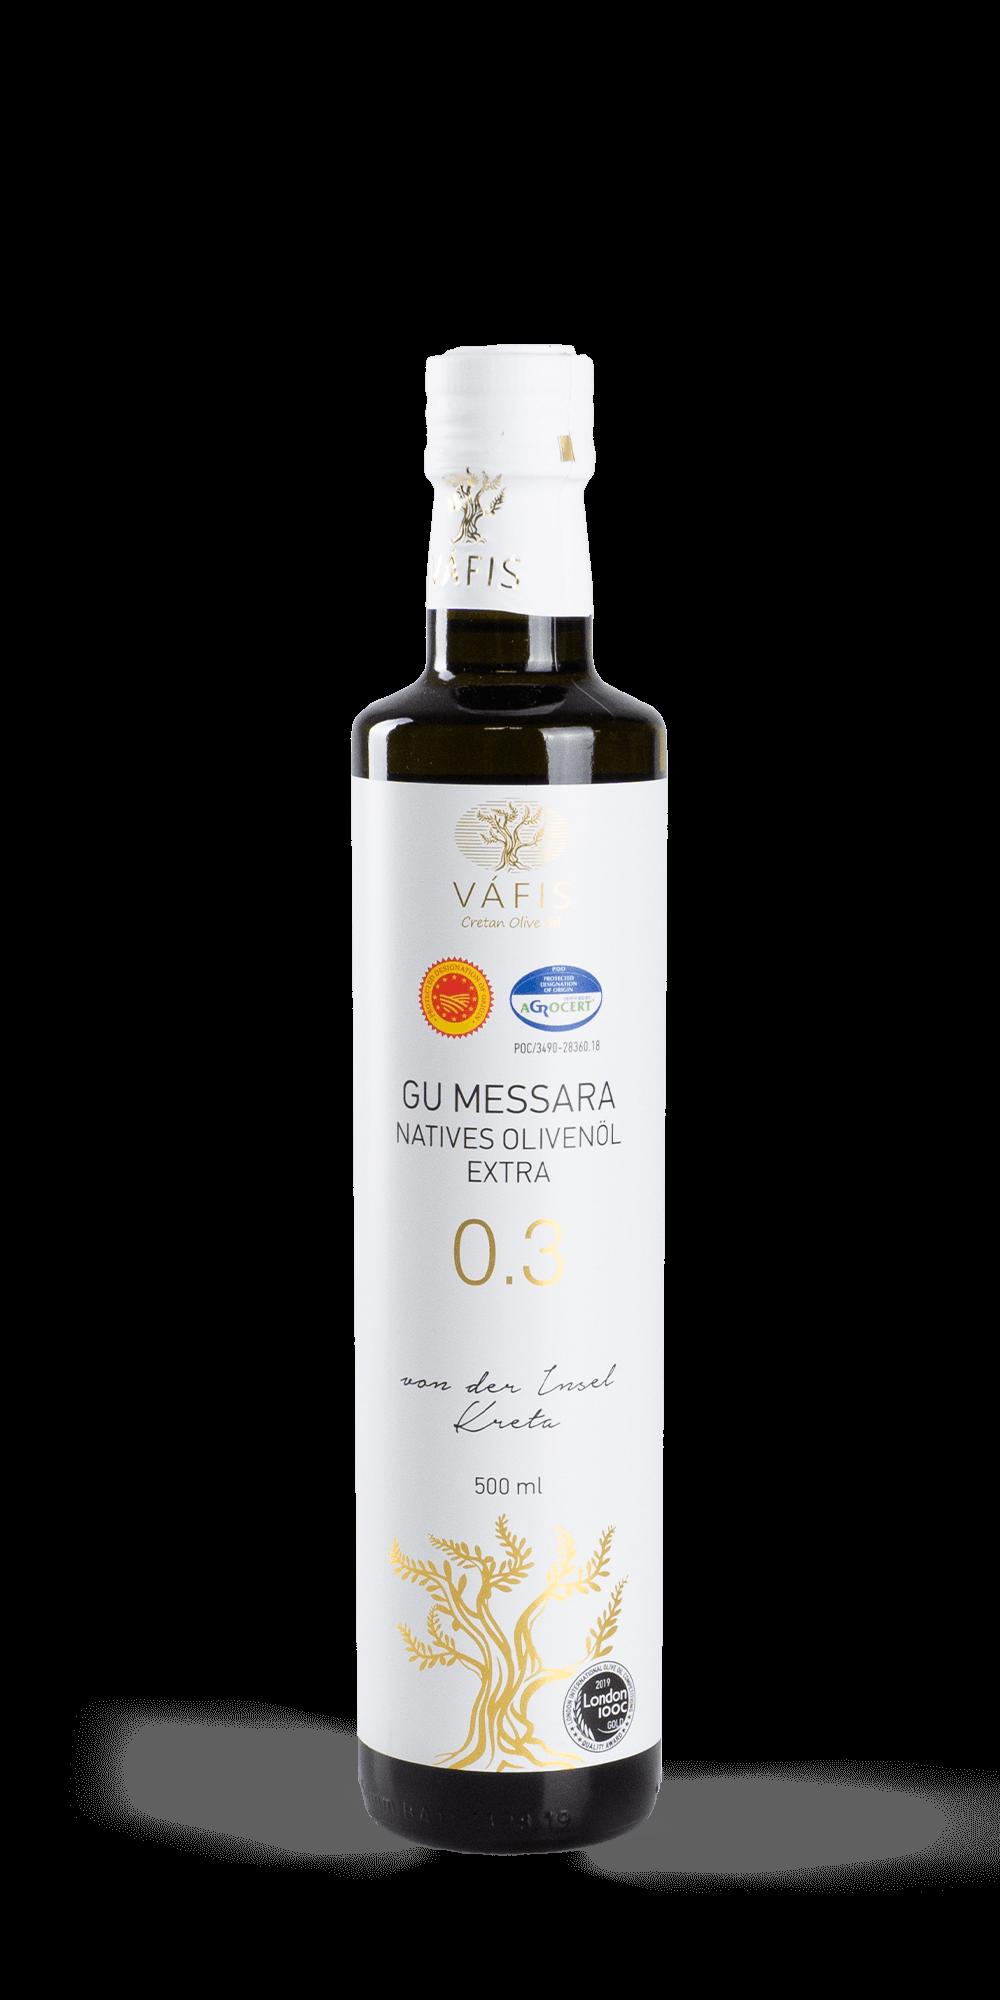 Vafis Olivenöl 0,5 l